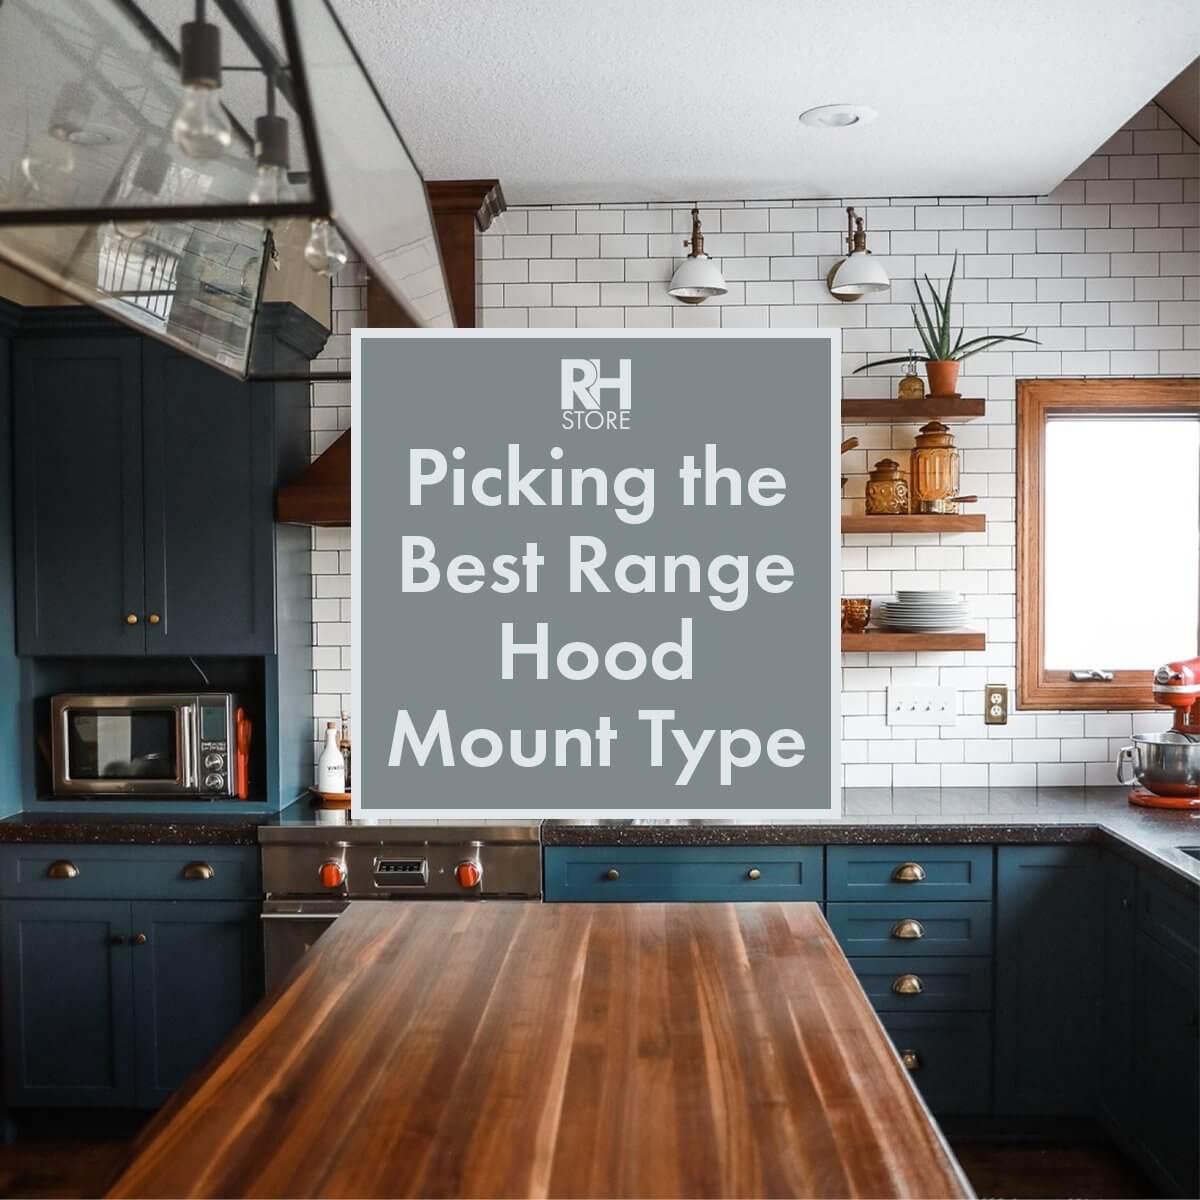 Picking the Best Range Hood Mount Type